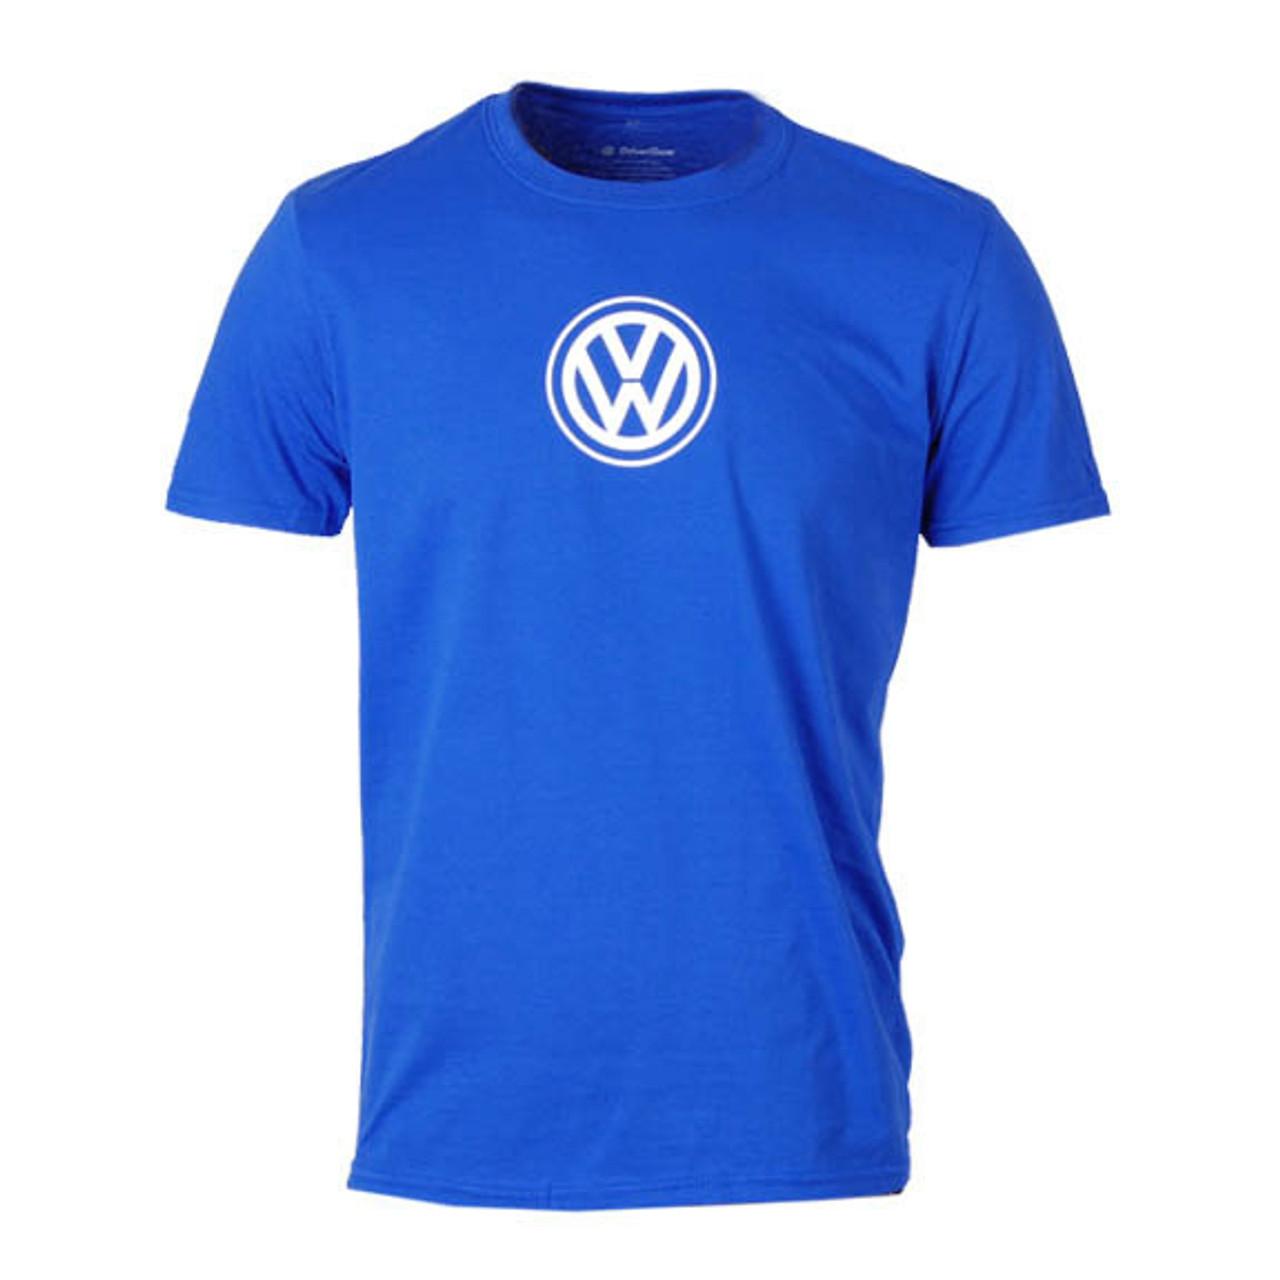 VW VOLKSWAGEN DUB polo shirt TShirt tee top Sizes PERSONALISATION XS-8XL